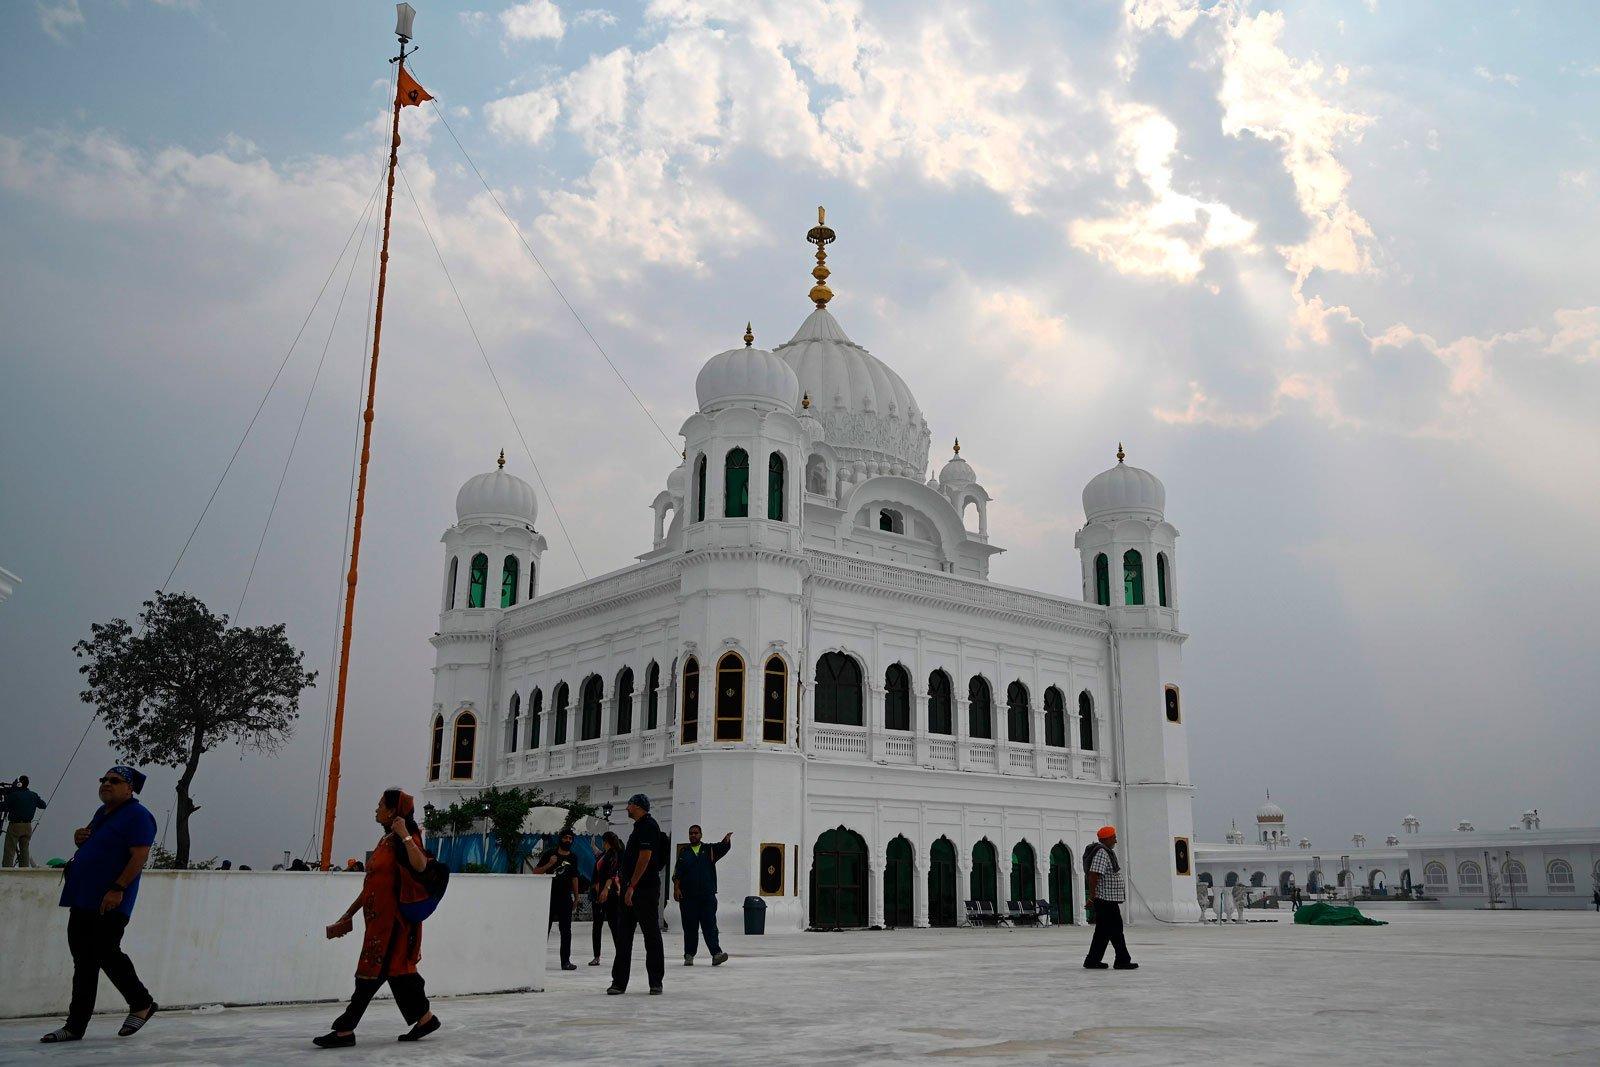 Sikh pilgrims from different countries visit the Shrine of Baba Guru Nanak Dev at the Gurdwara Darbar Sahib — AFP photo